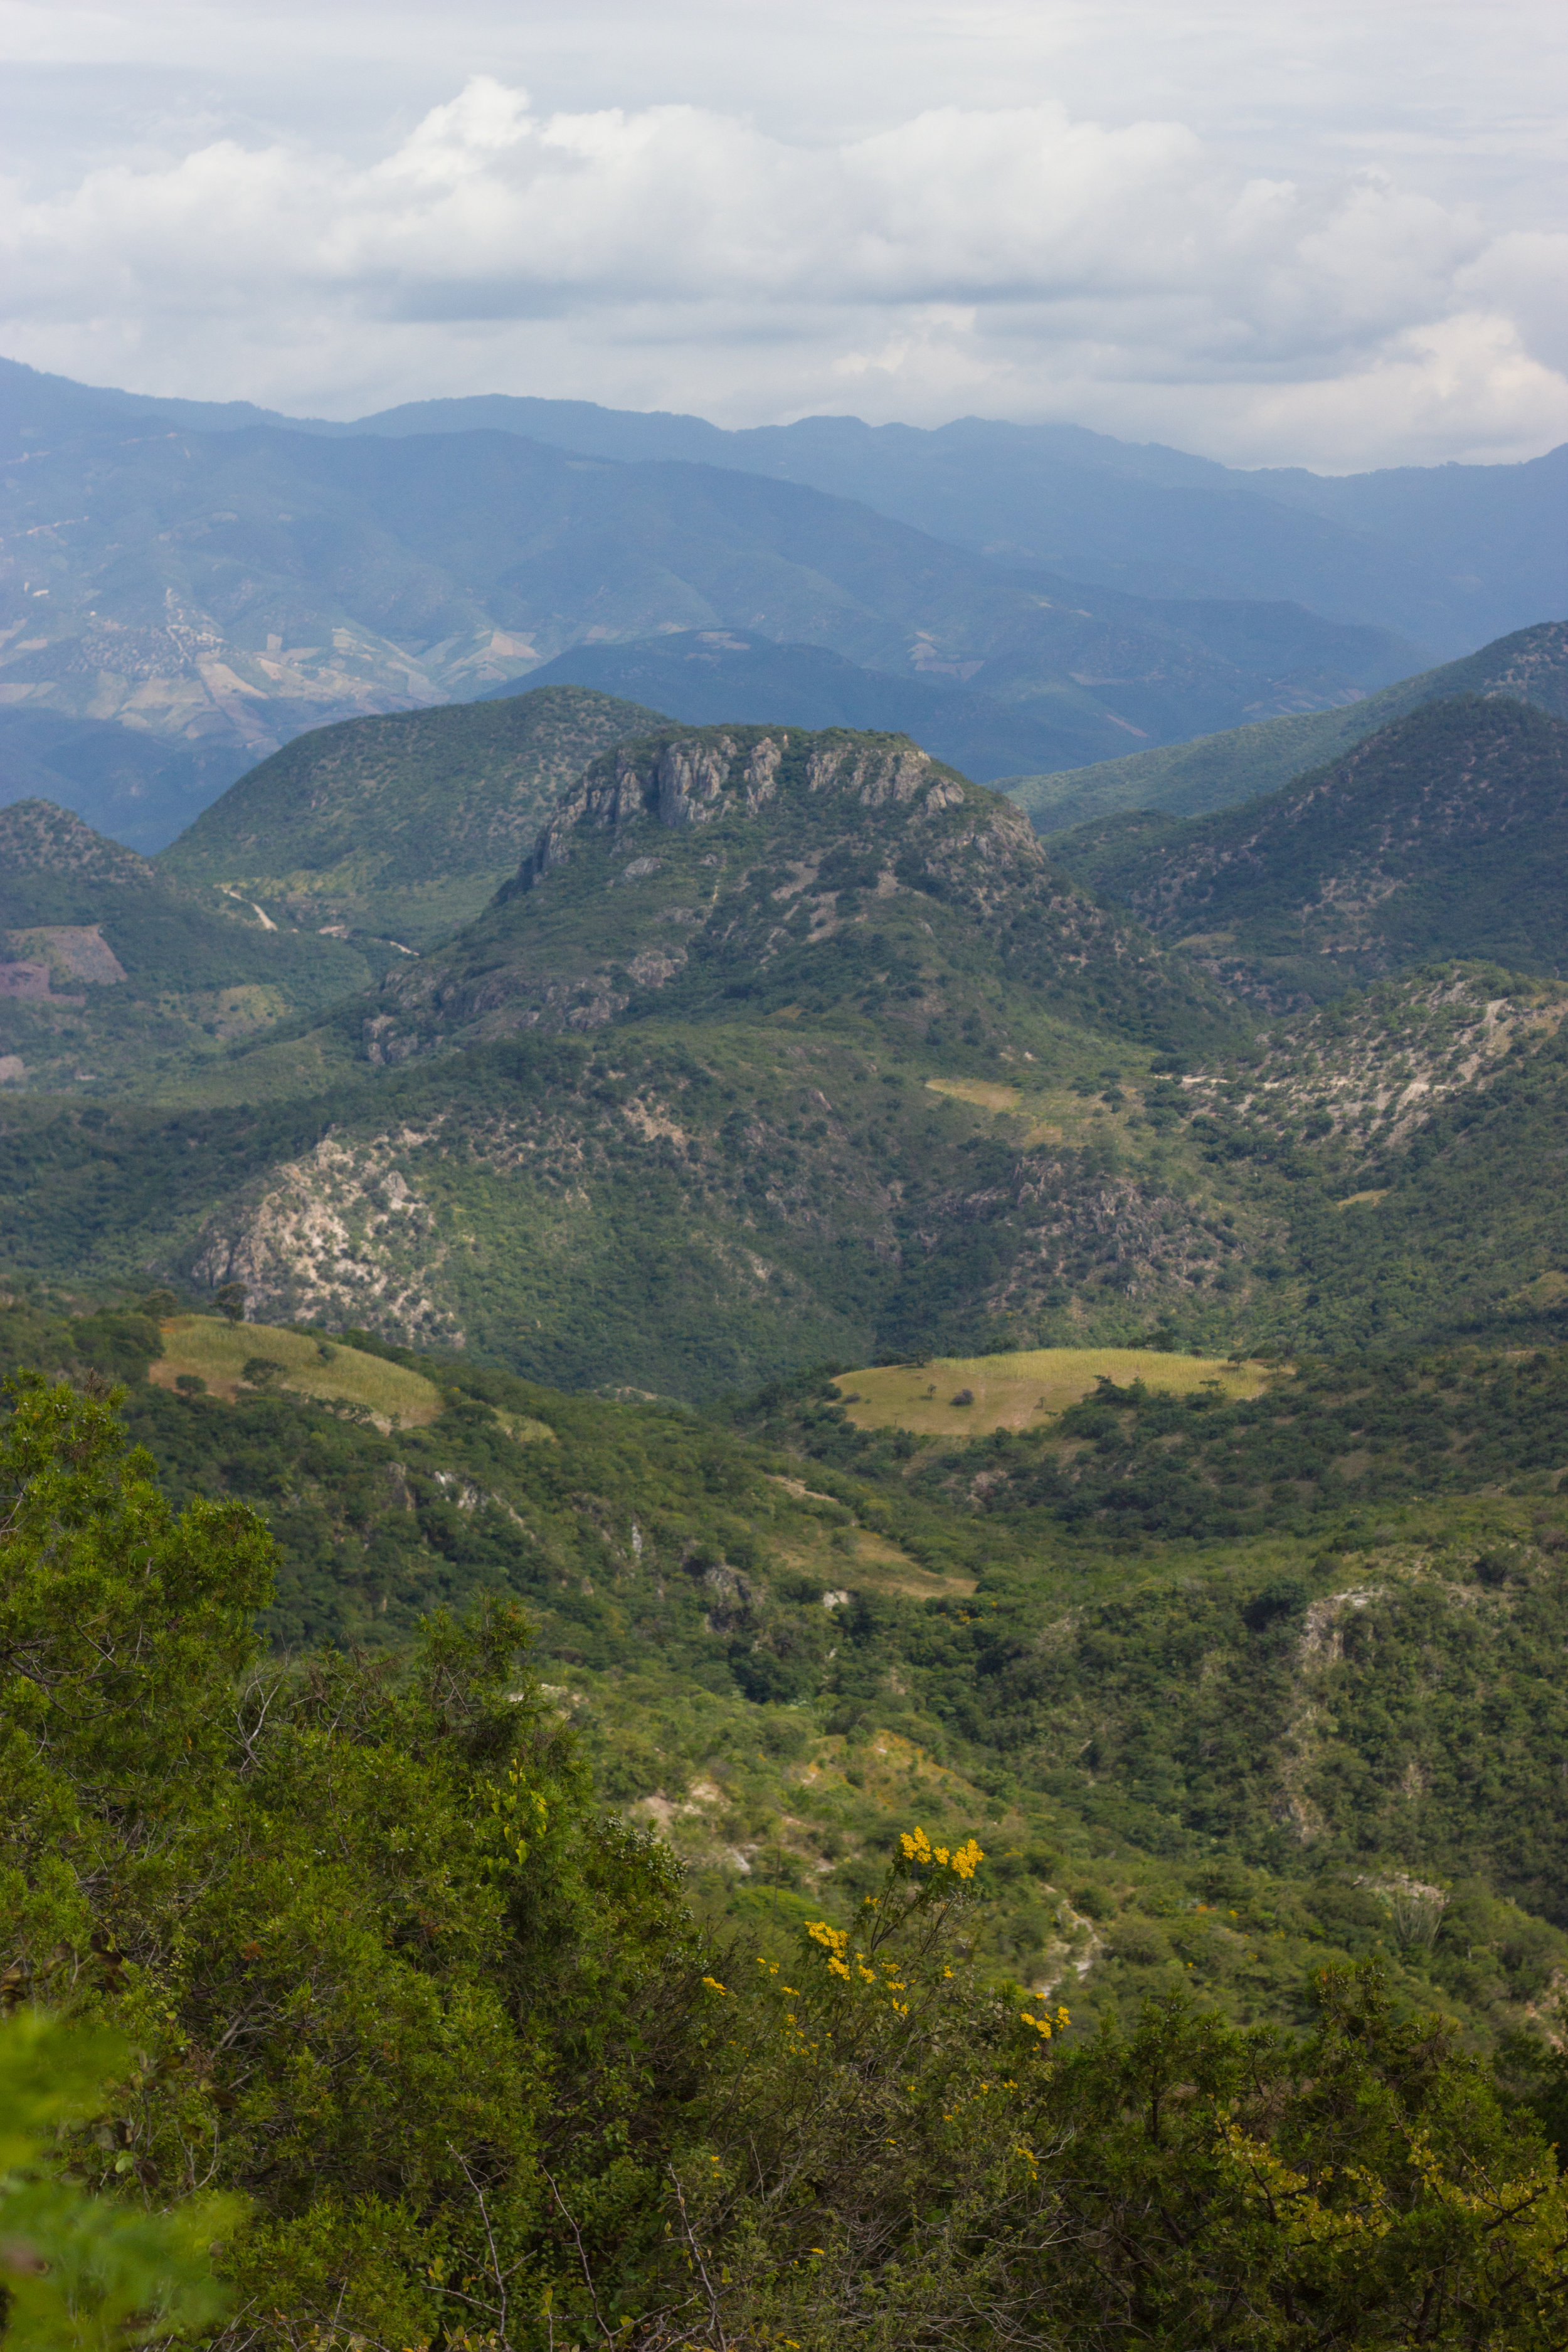 oaxaca mountain landscape by leah pellegrini for thread caravan.jpg